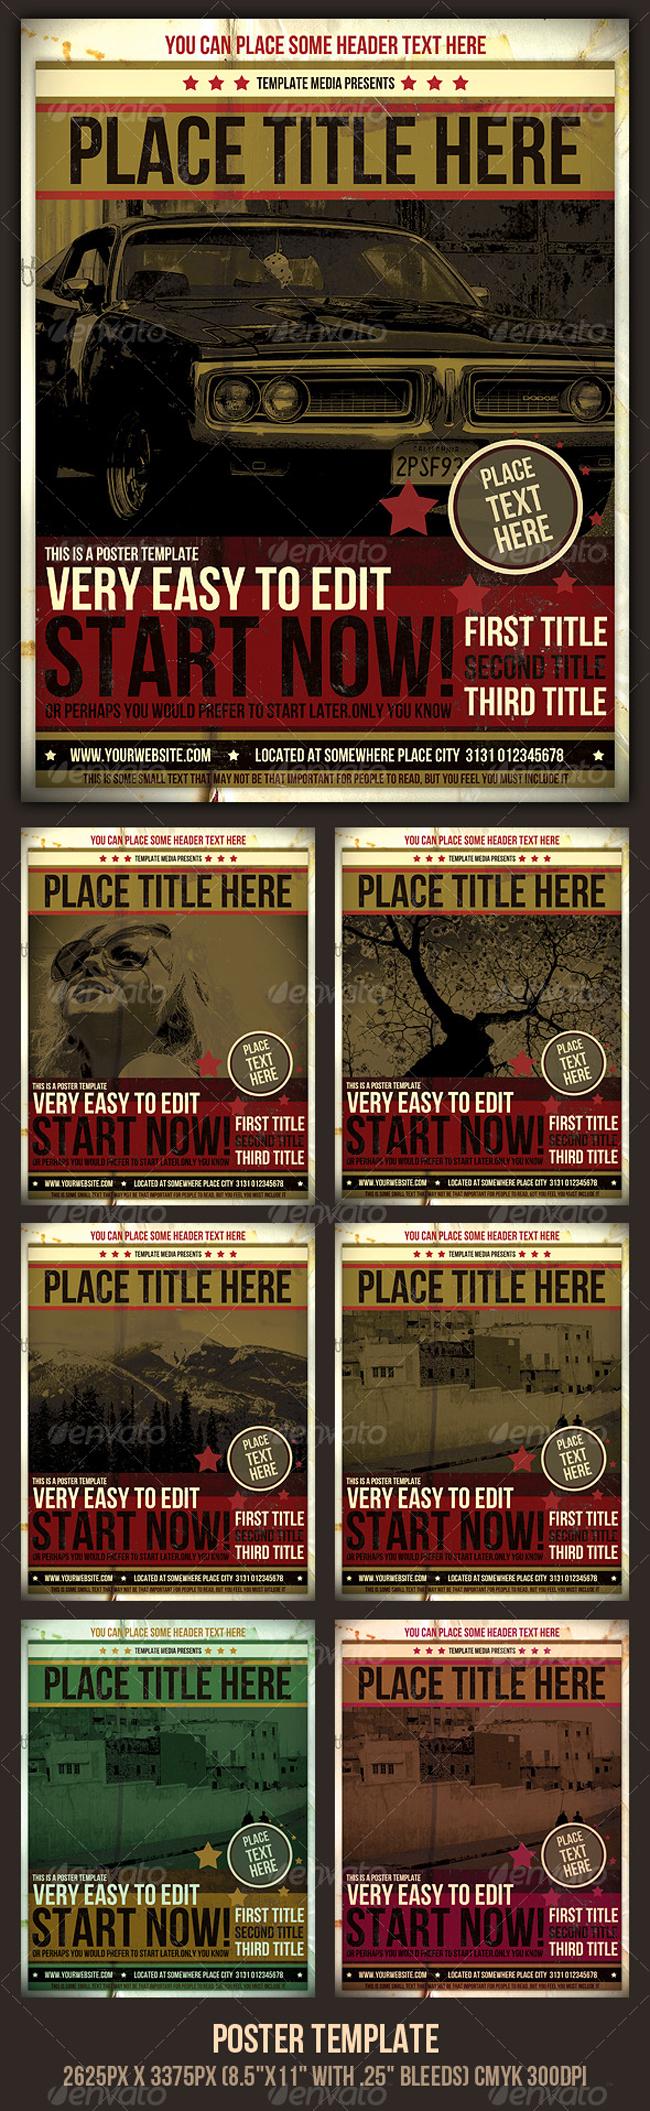 Poster Templates  10 Diseños de Posters Increibles